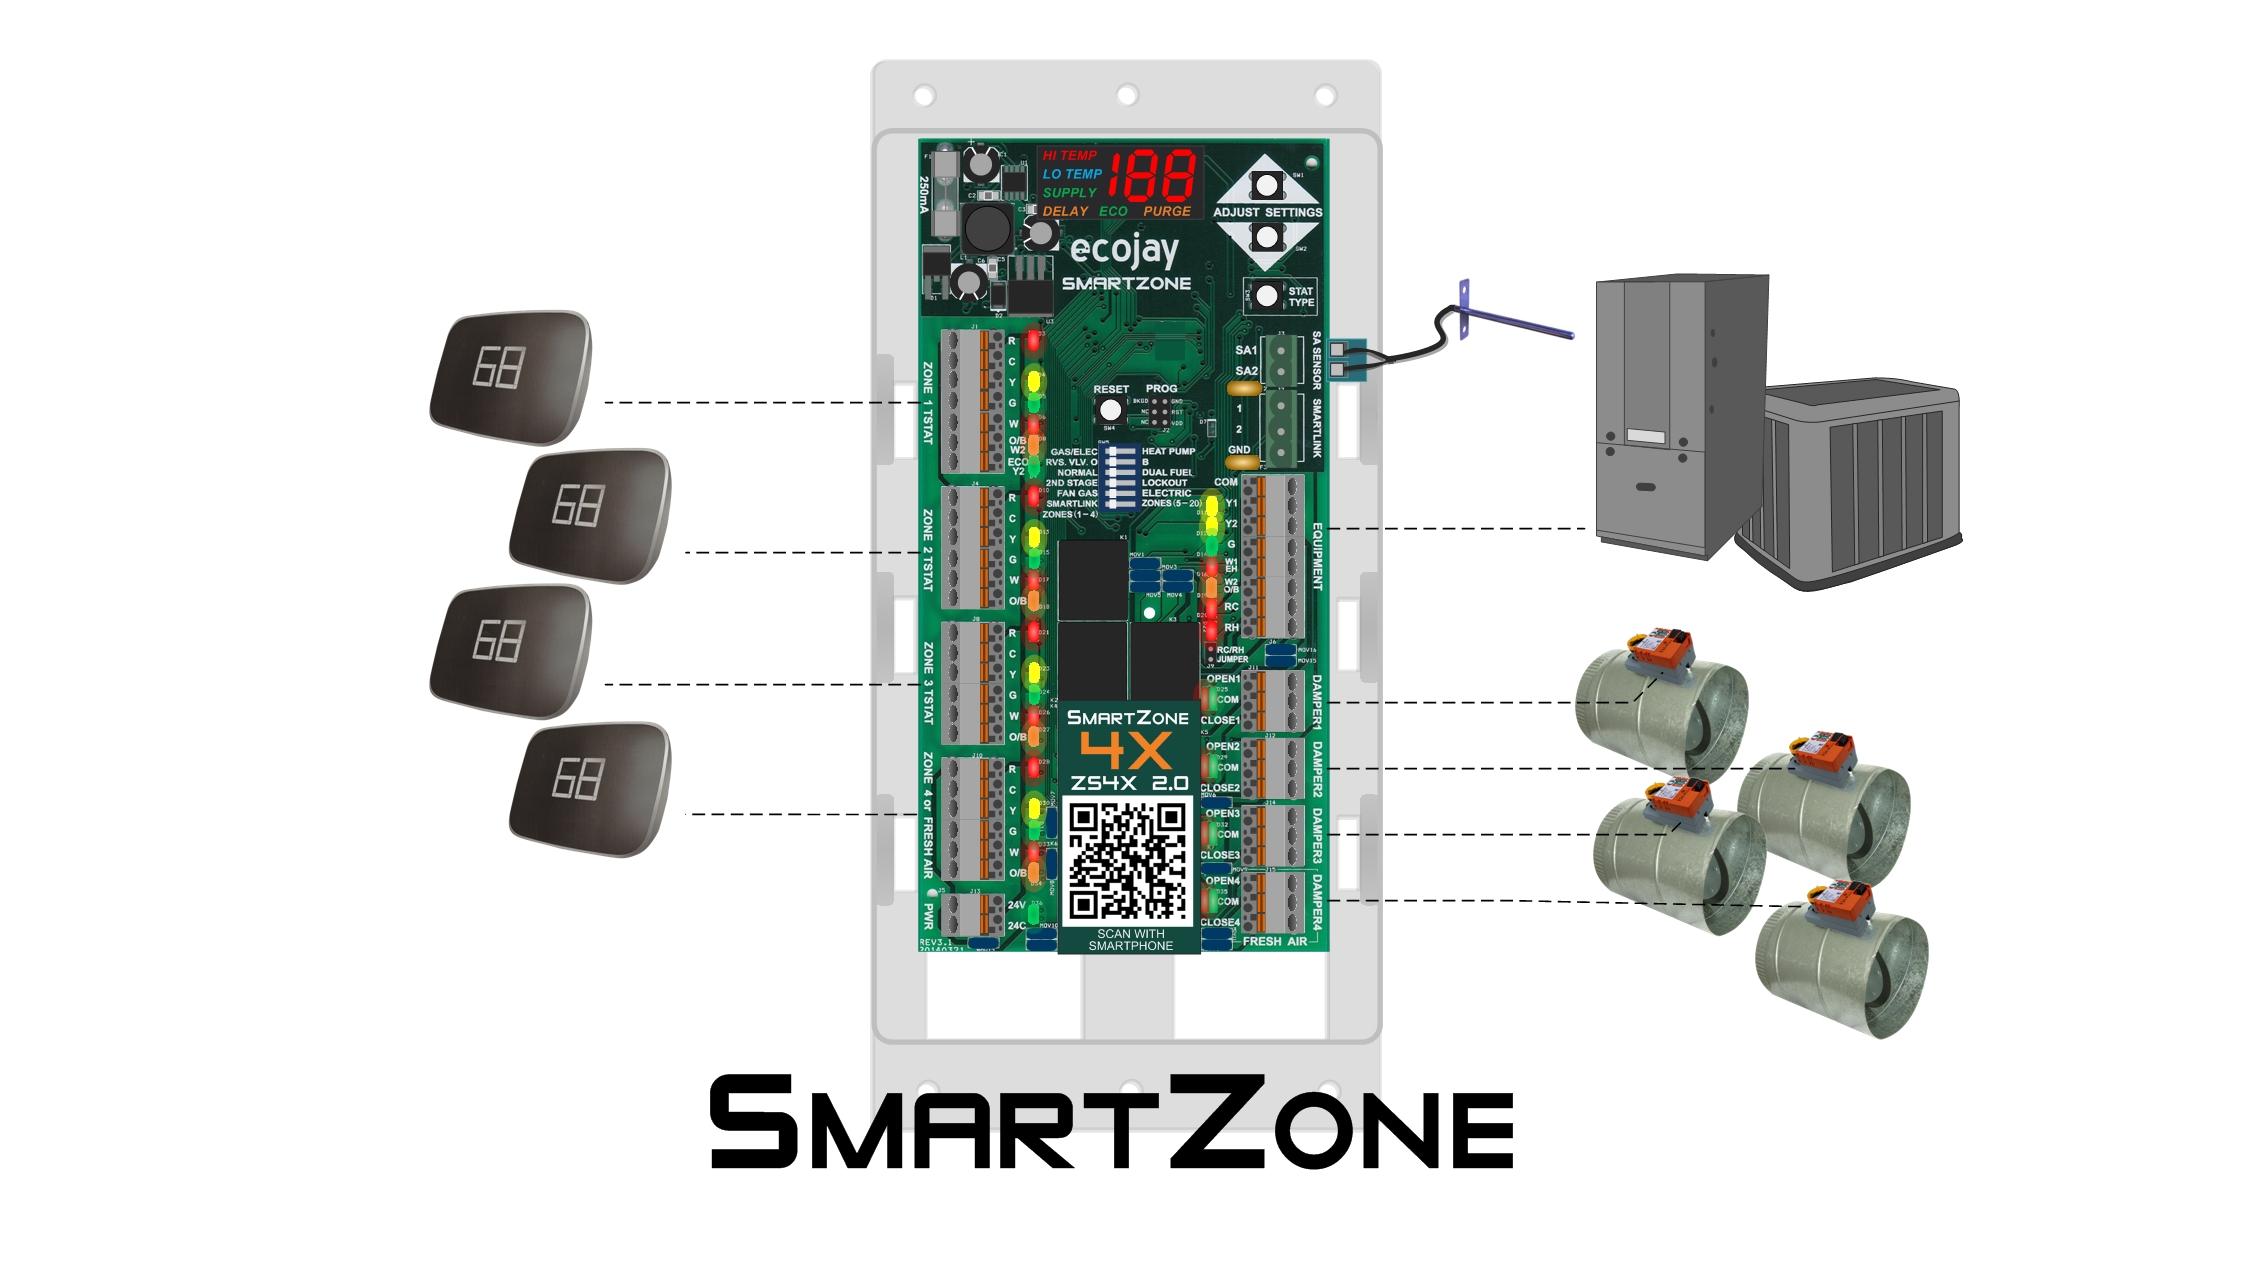 smartzone zone control better than ductless mini-split